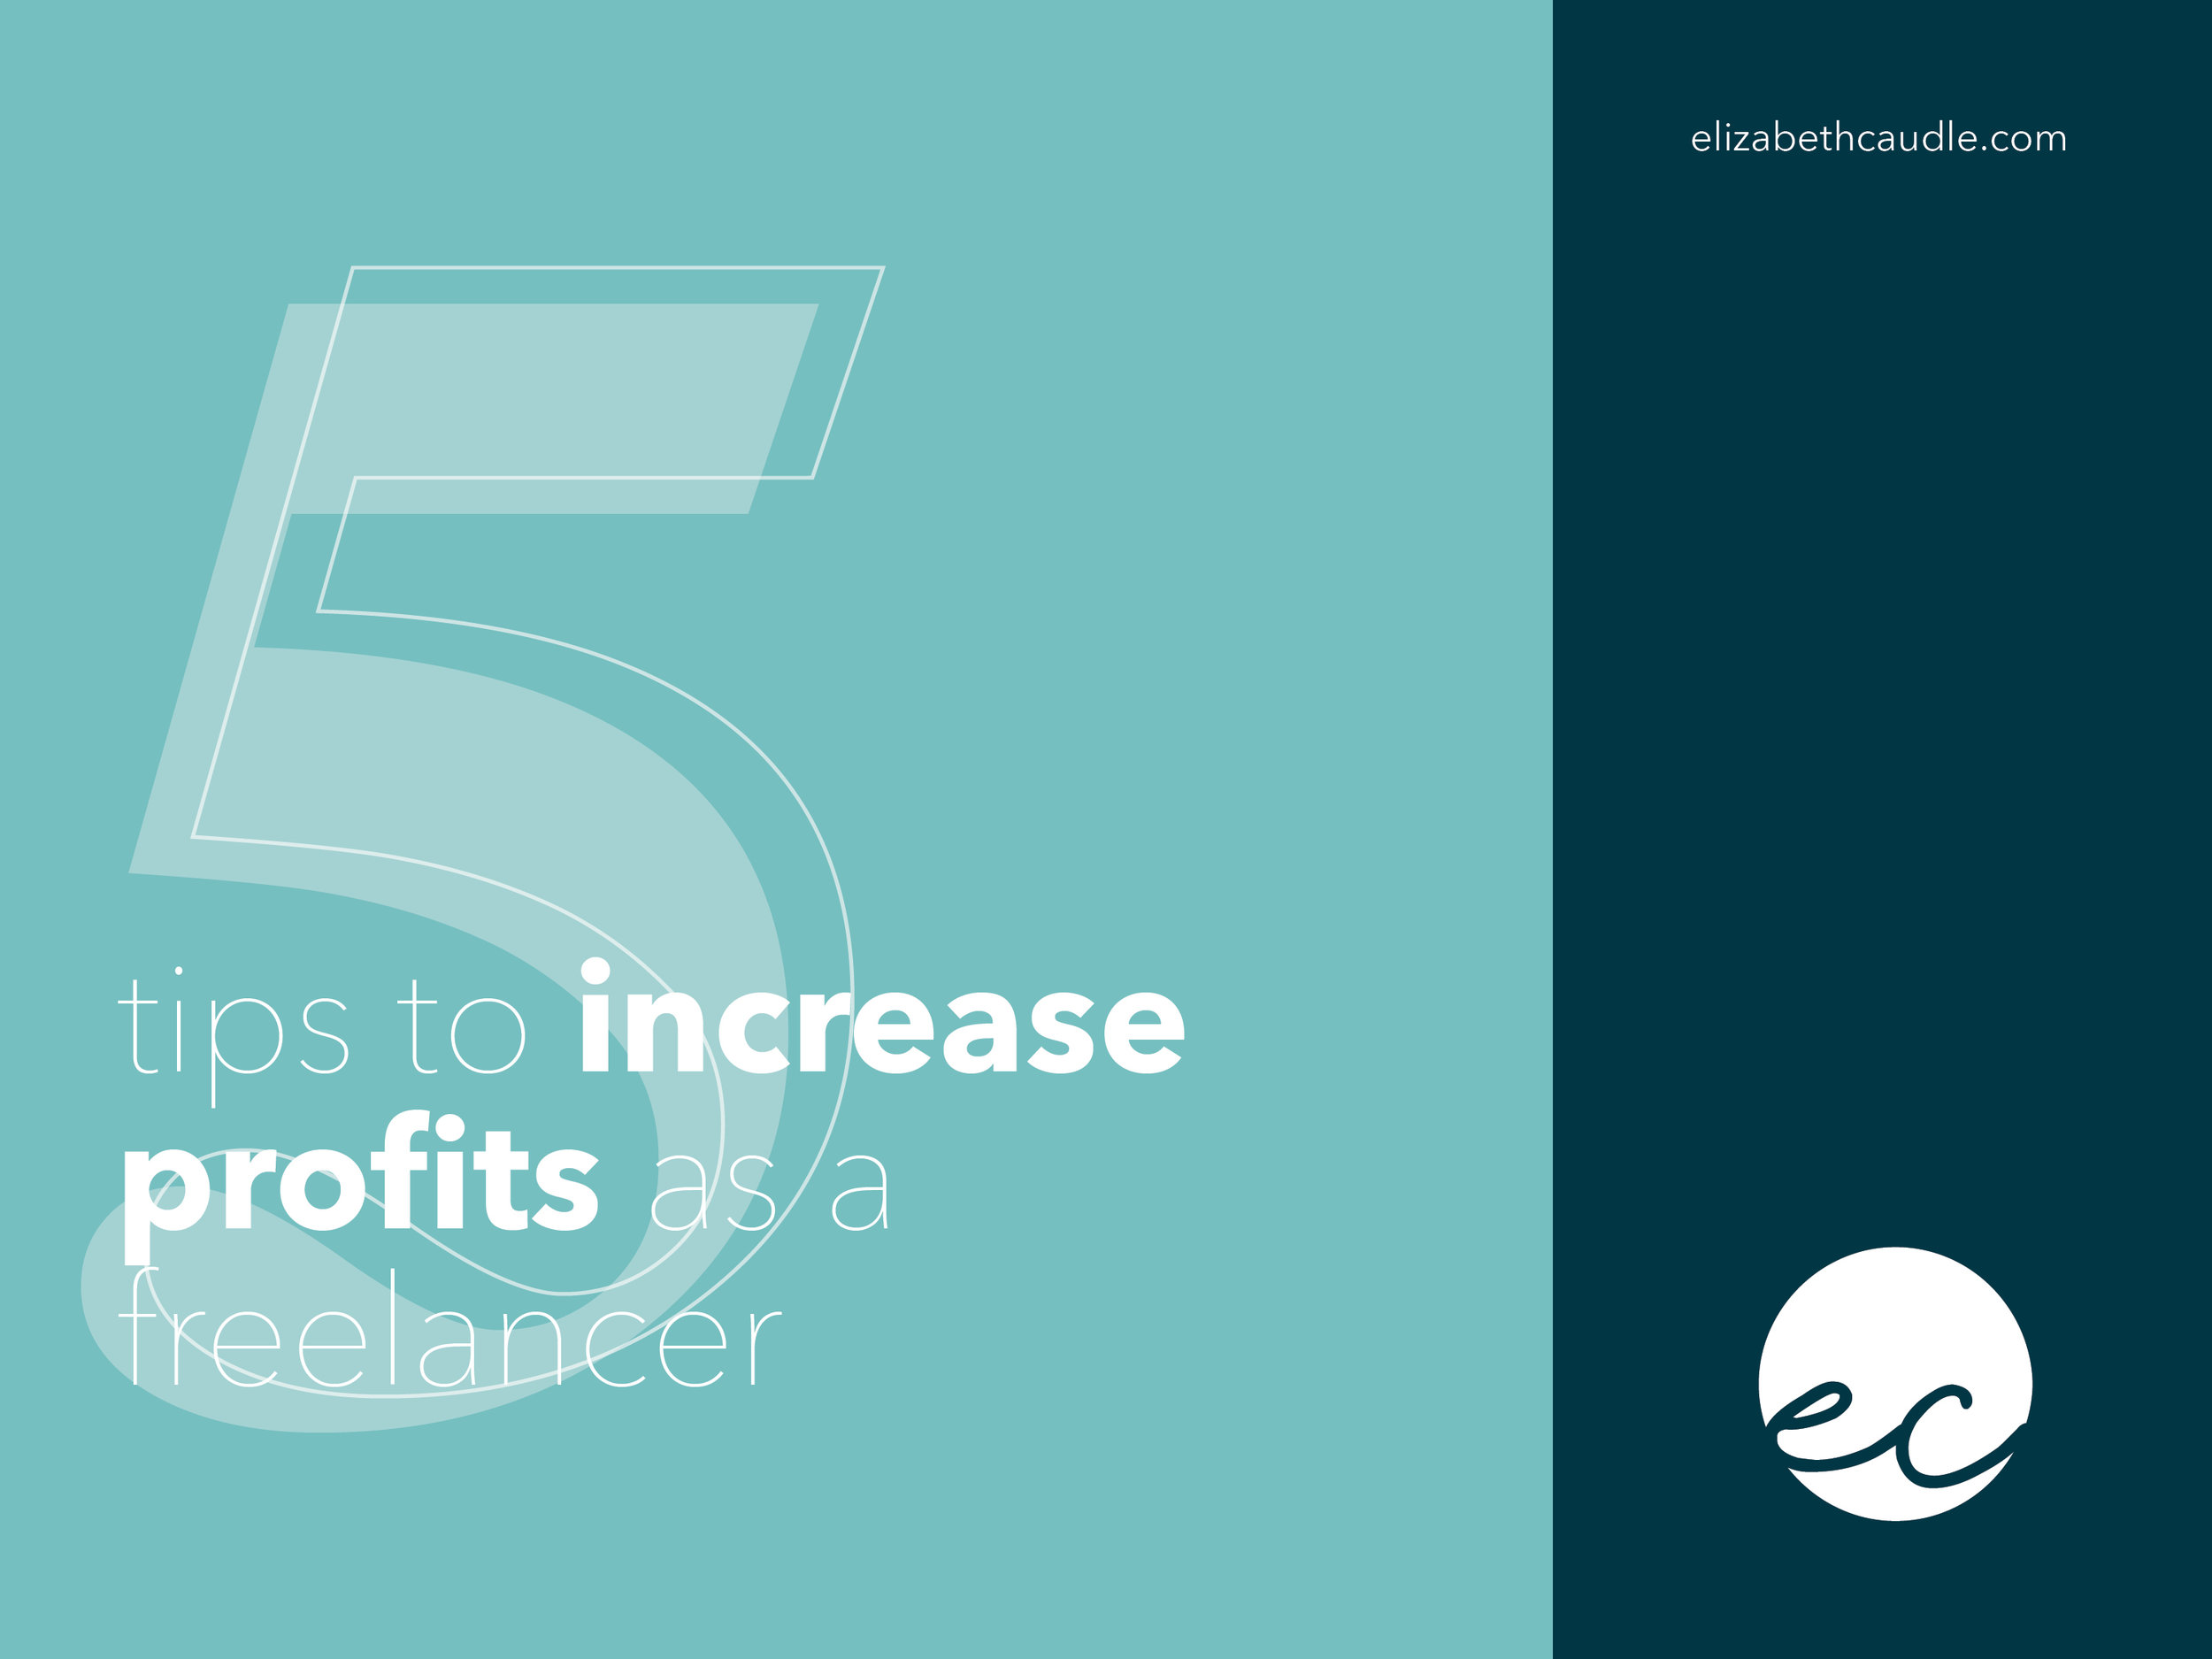 5 tips to increase profitability as a freelancer.jpg